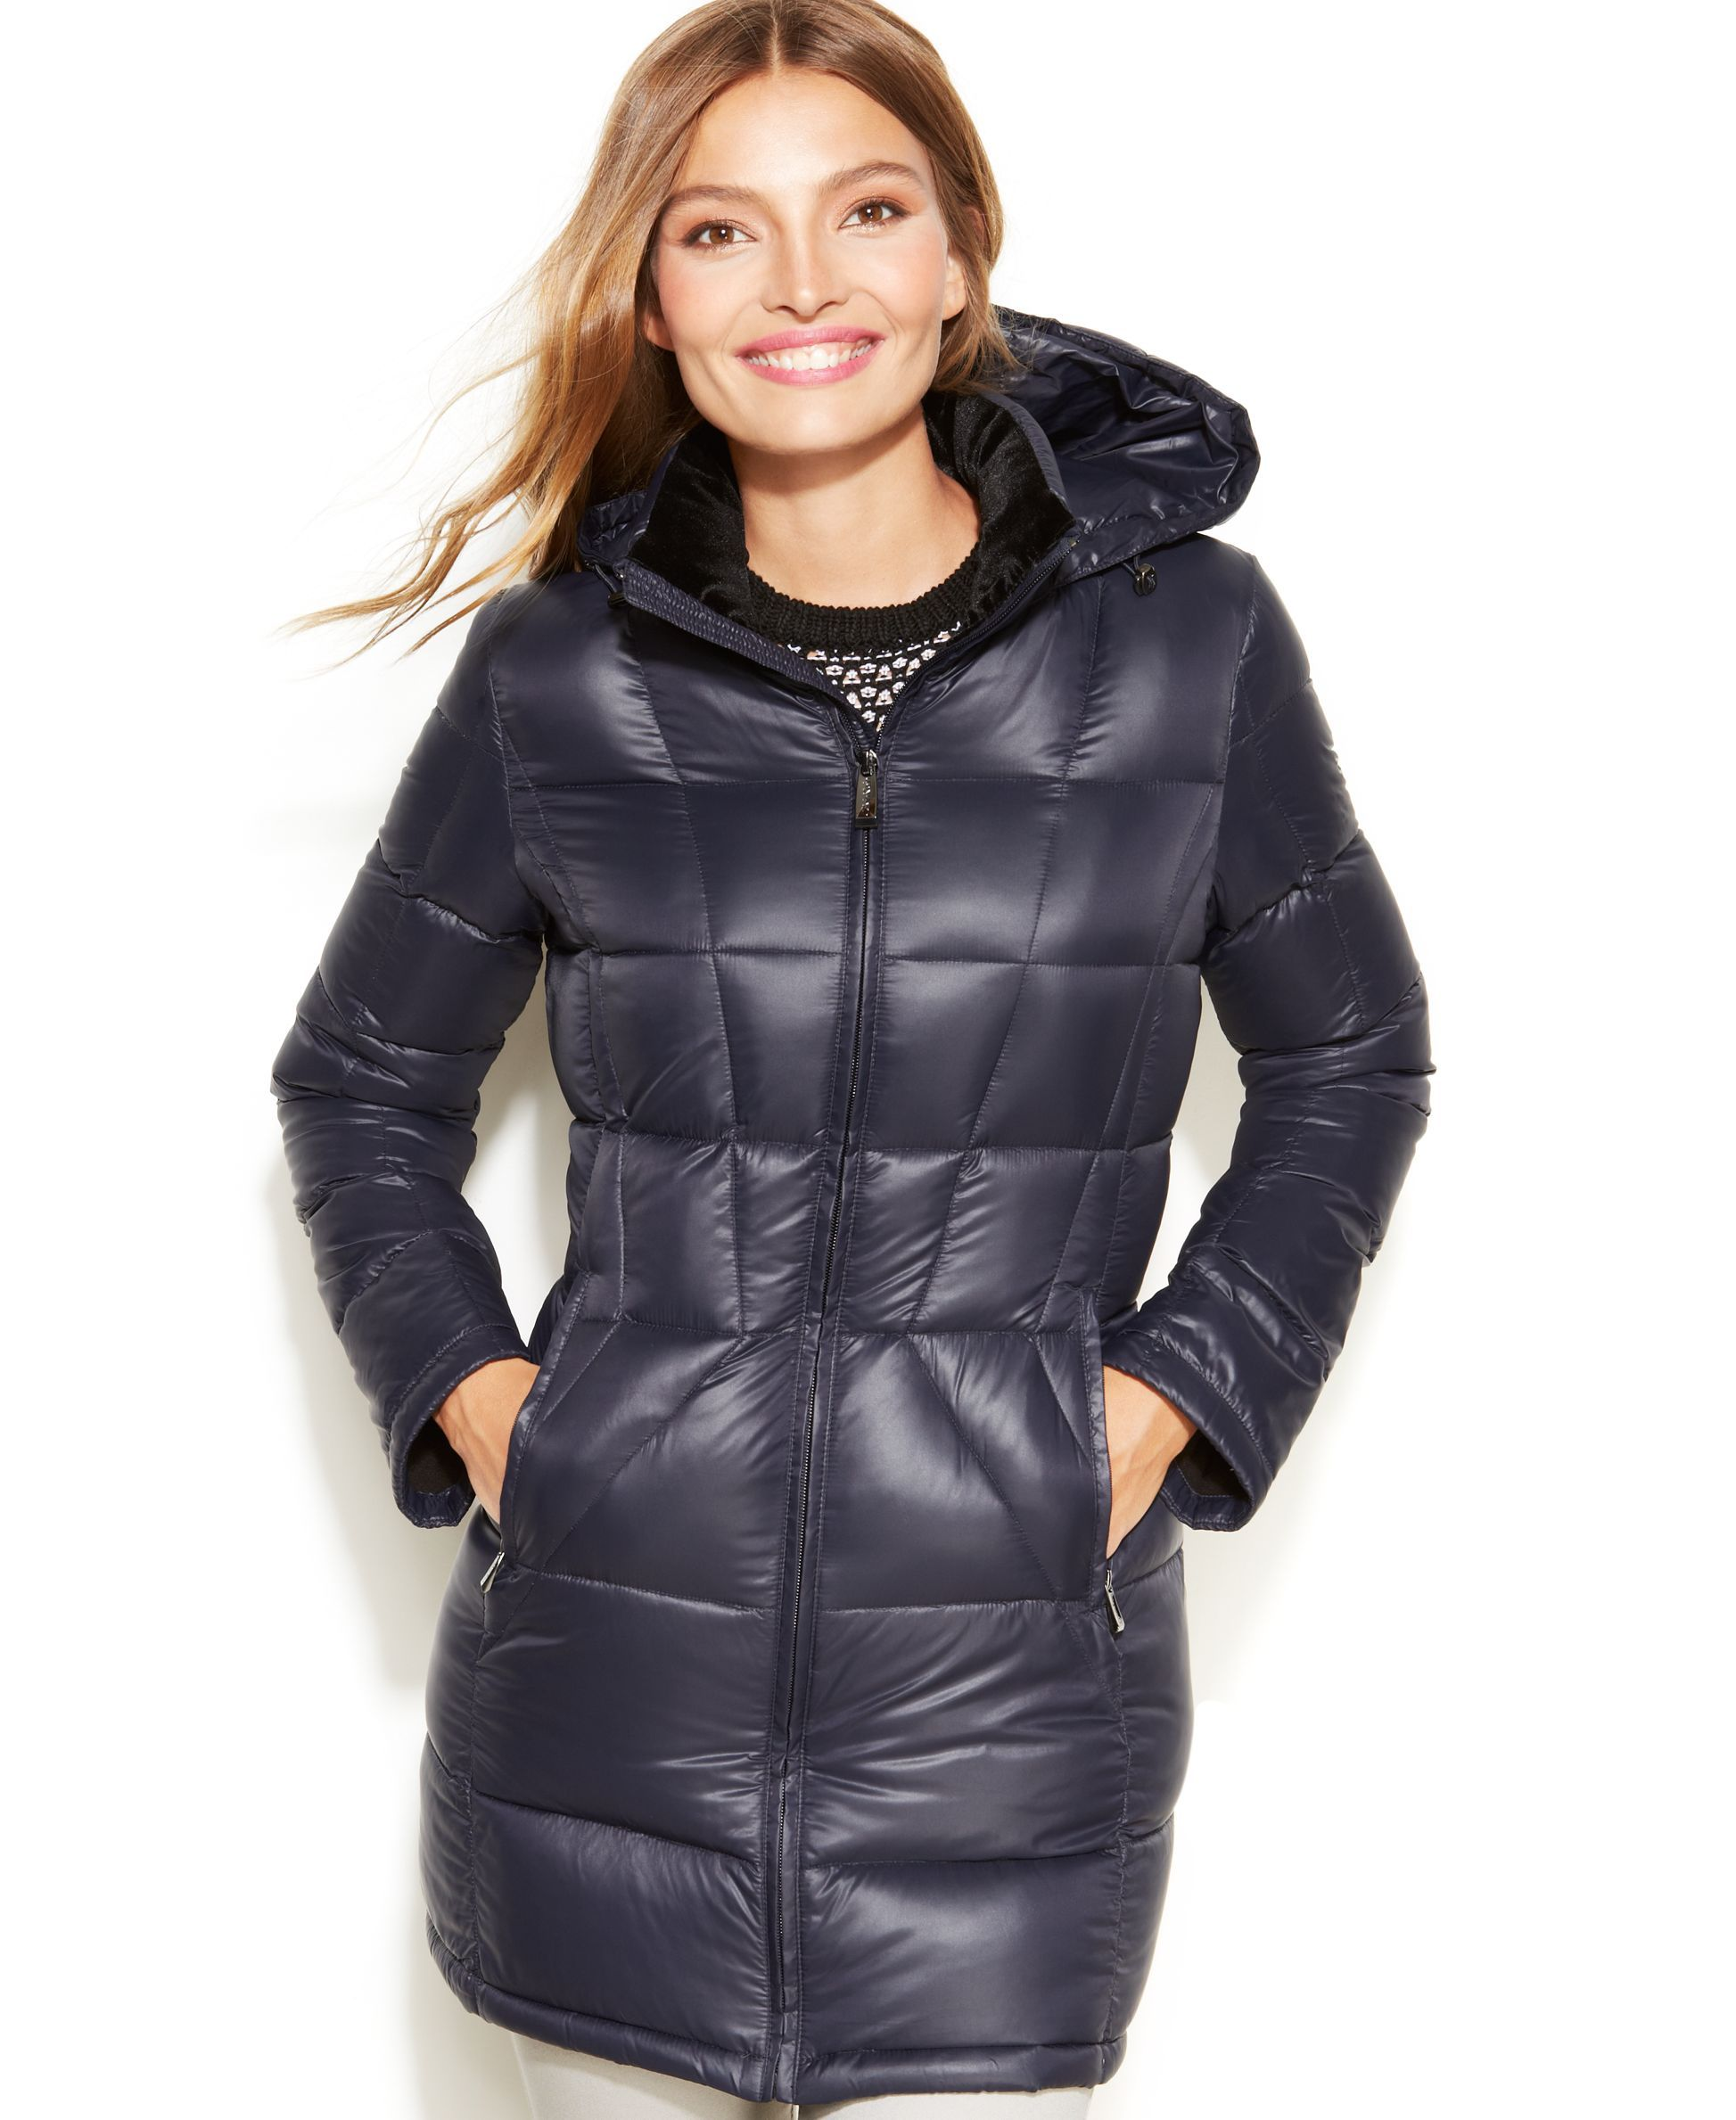 Calvin Klein Petite Packable Quilted Down Puffer Jacket Coats Women Macy S Coats For Women Puffer Jacket Women Stylish Winter Coats [ 2378 x 1947 Pixel ]